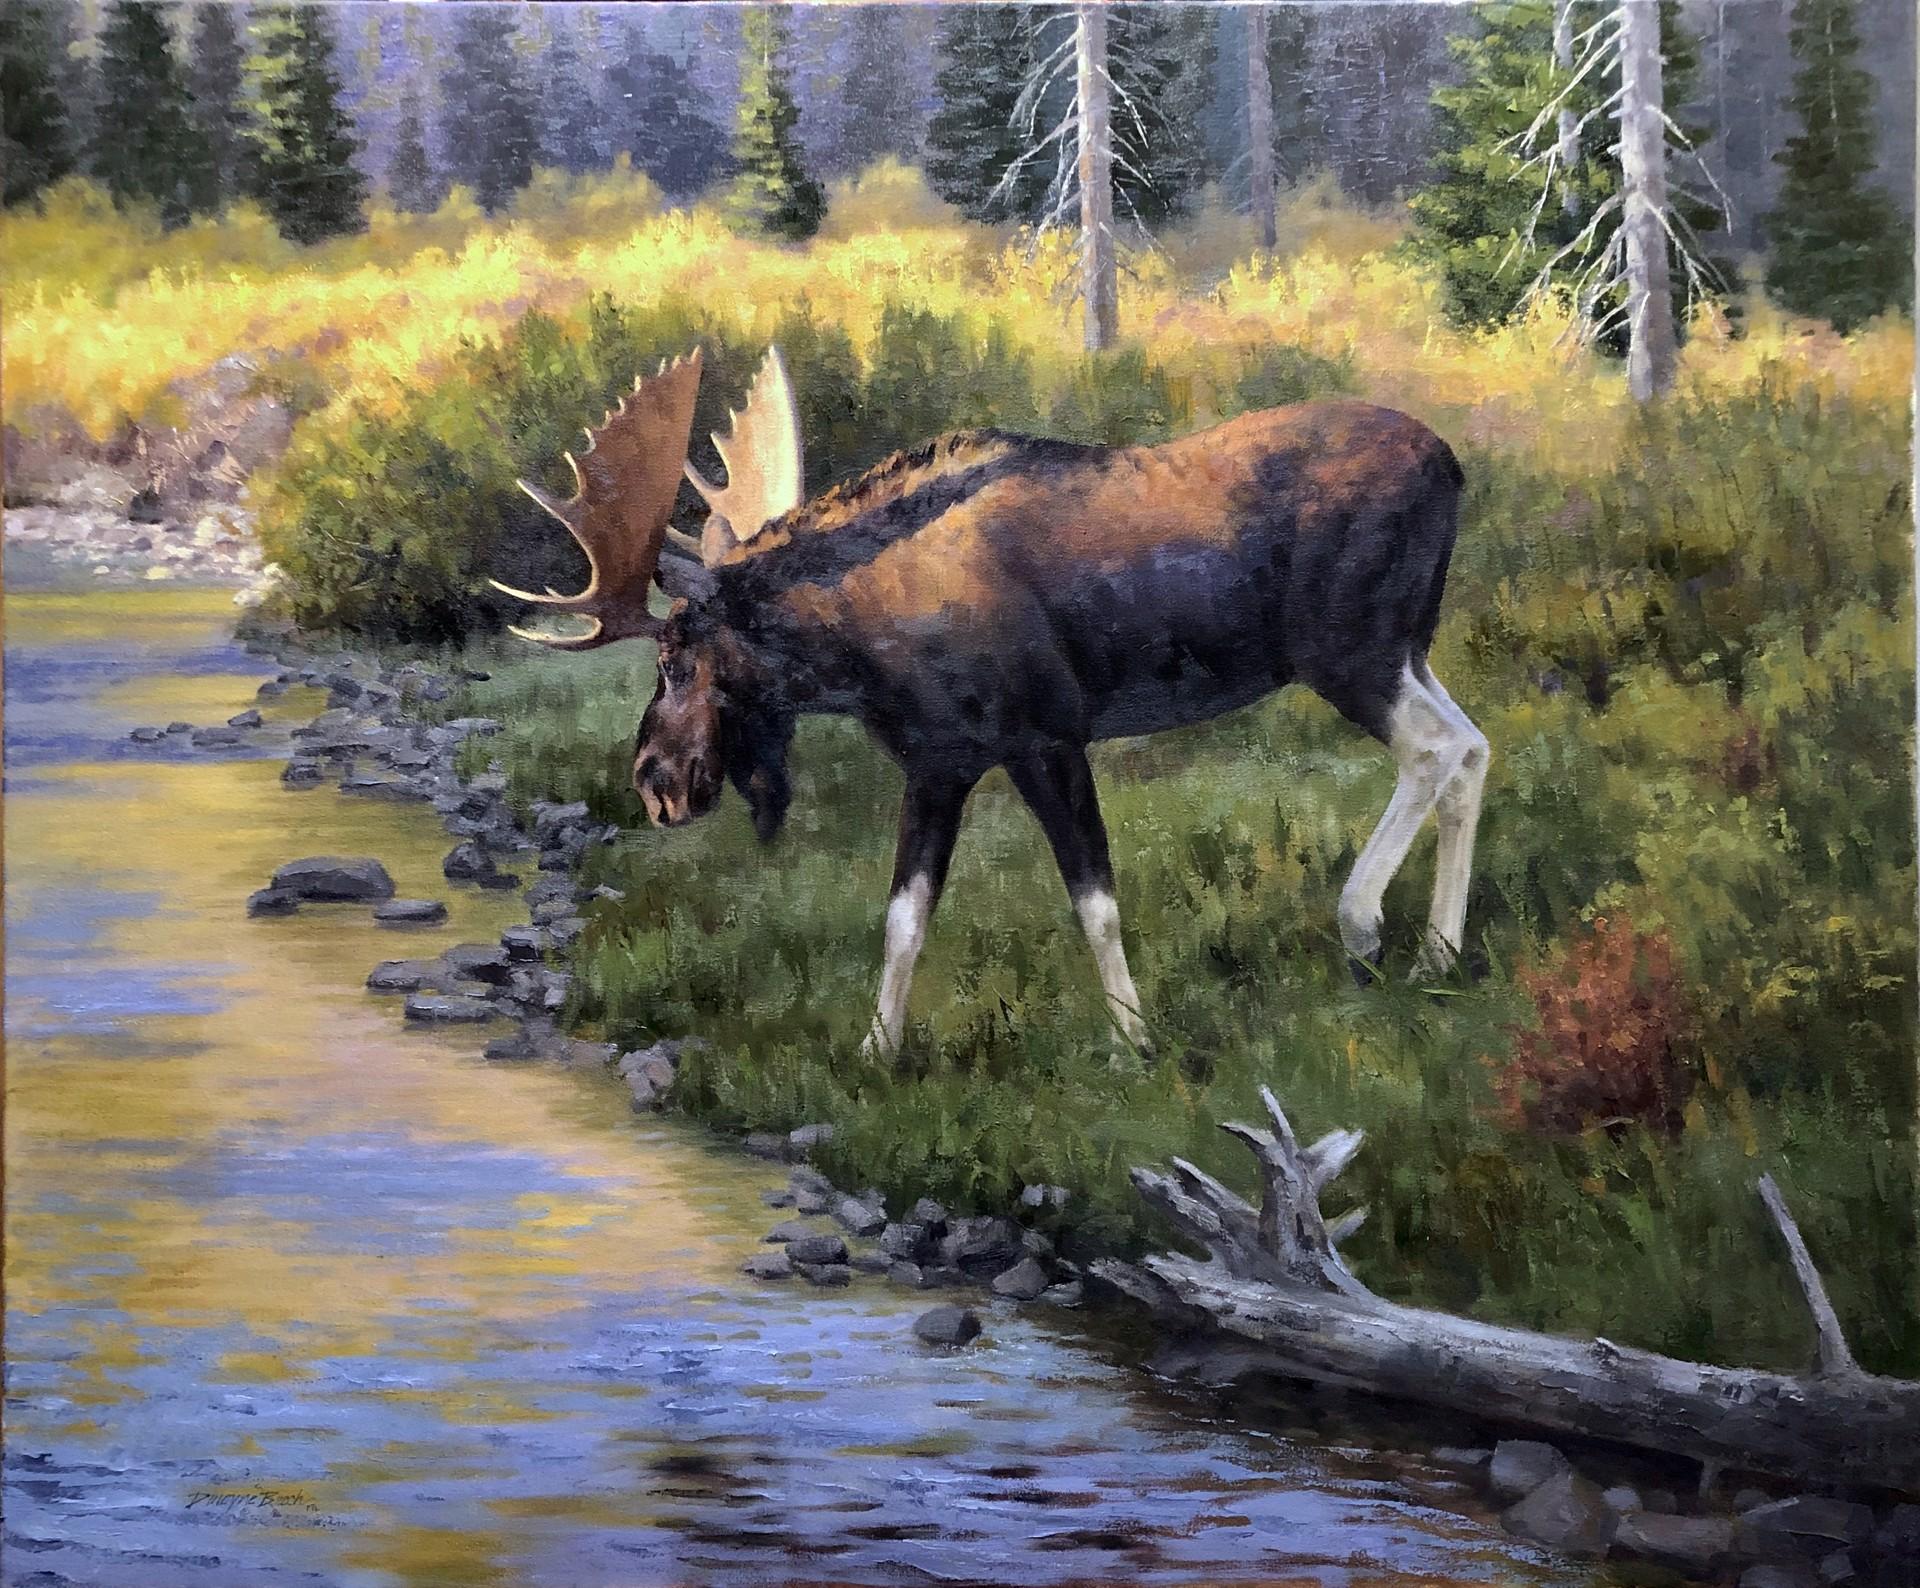 Willow Creek Wanderer by Dwayne Brech